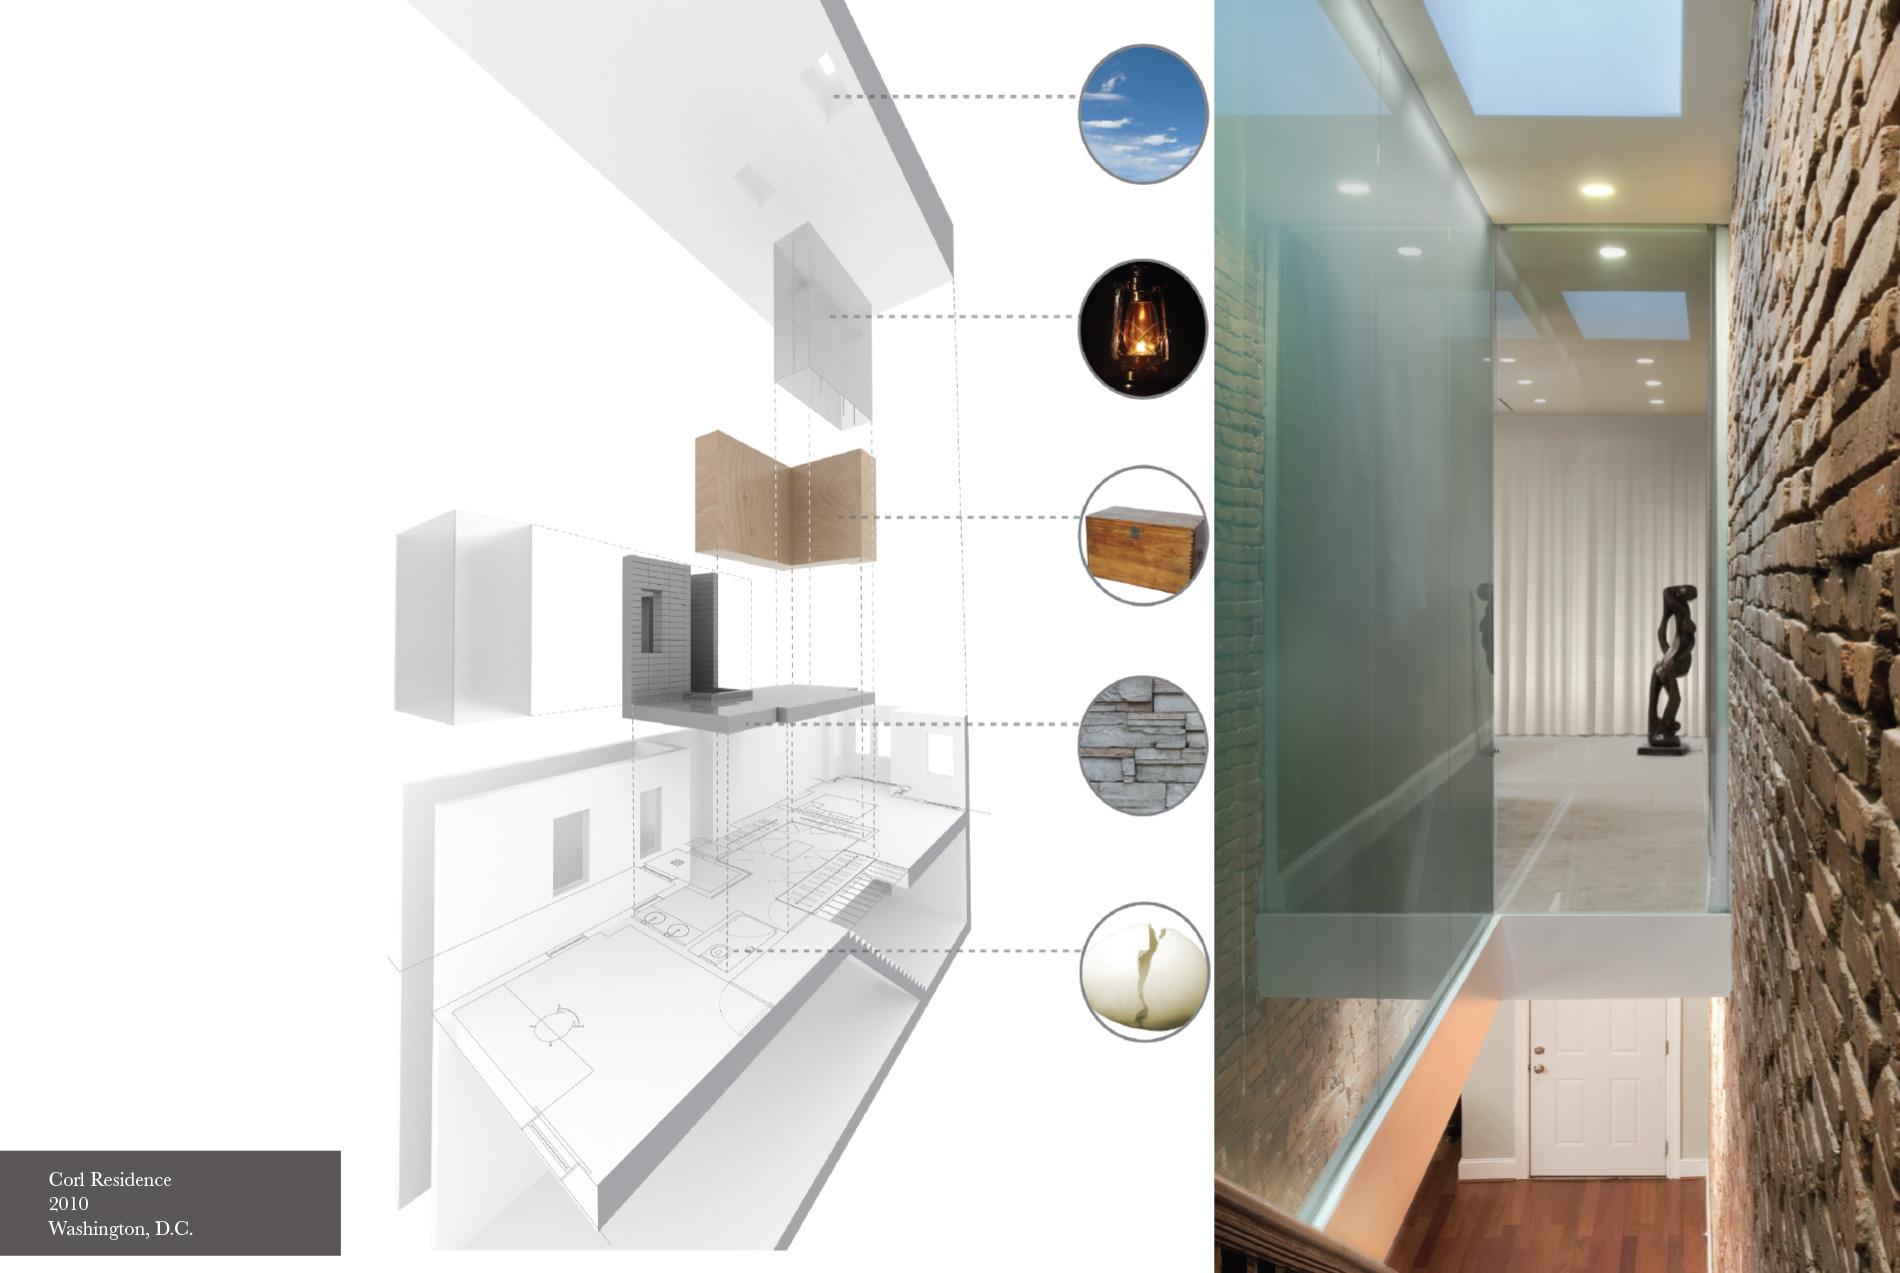 Studio Twenty Seven Architecture Fragment 01 Memory